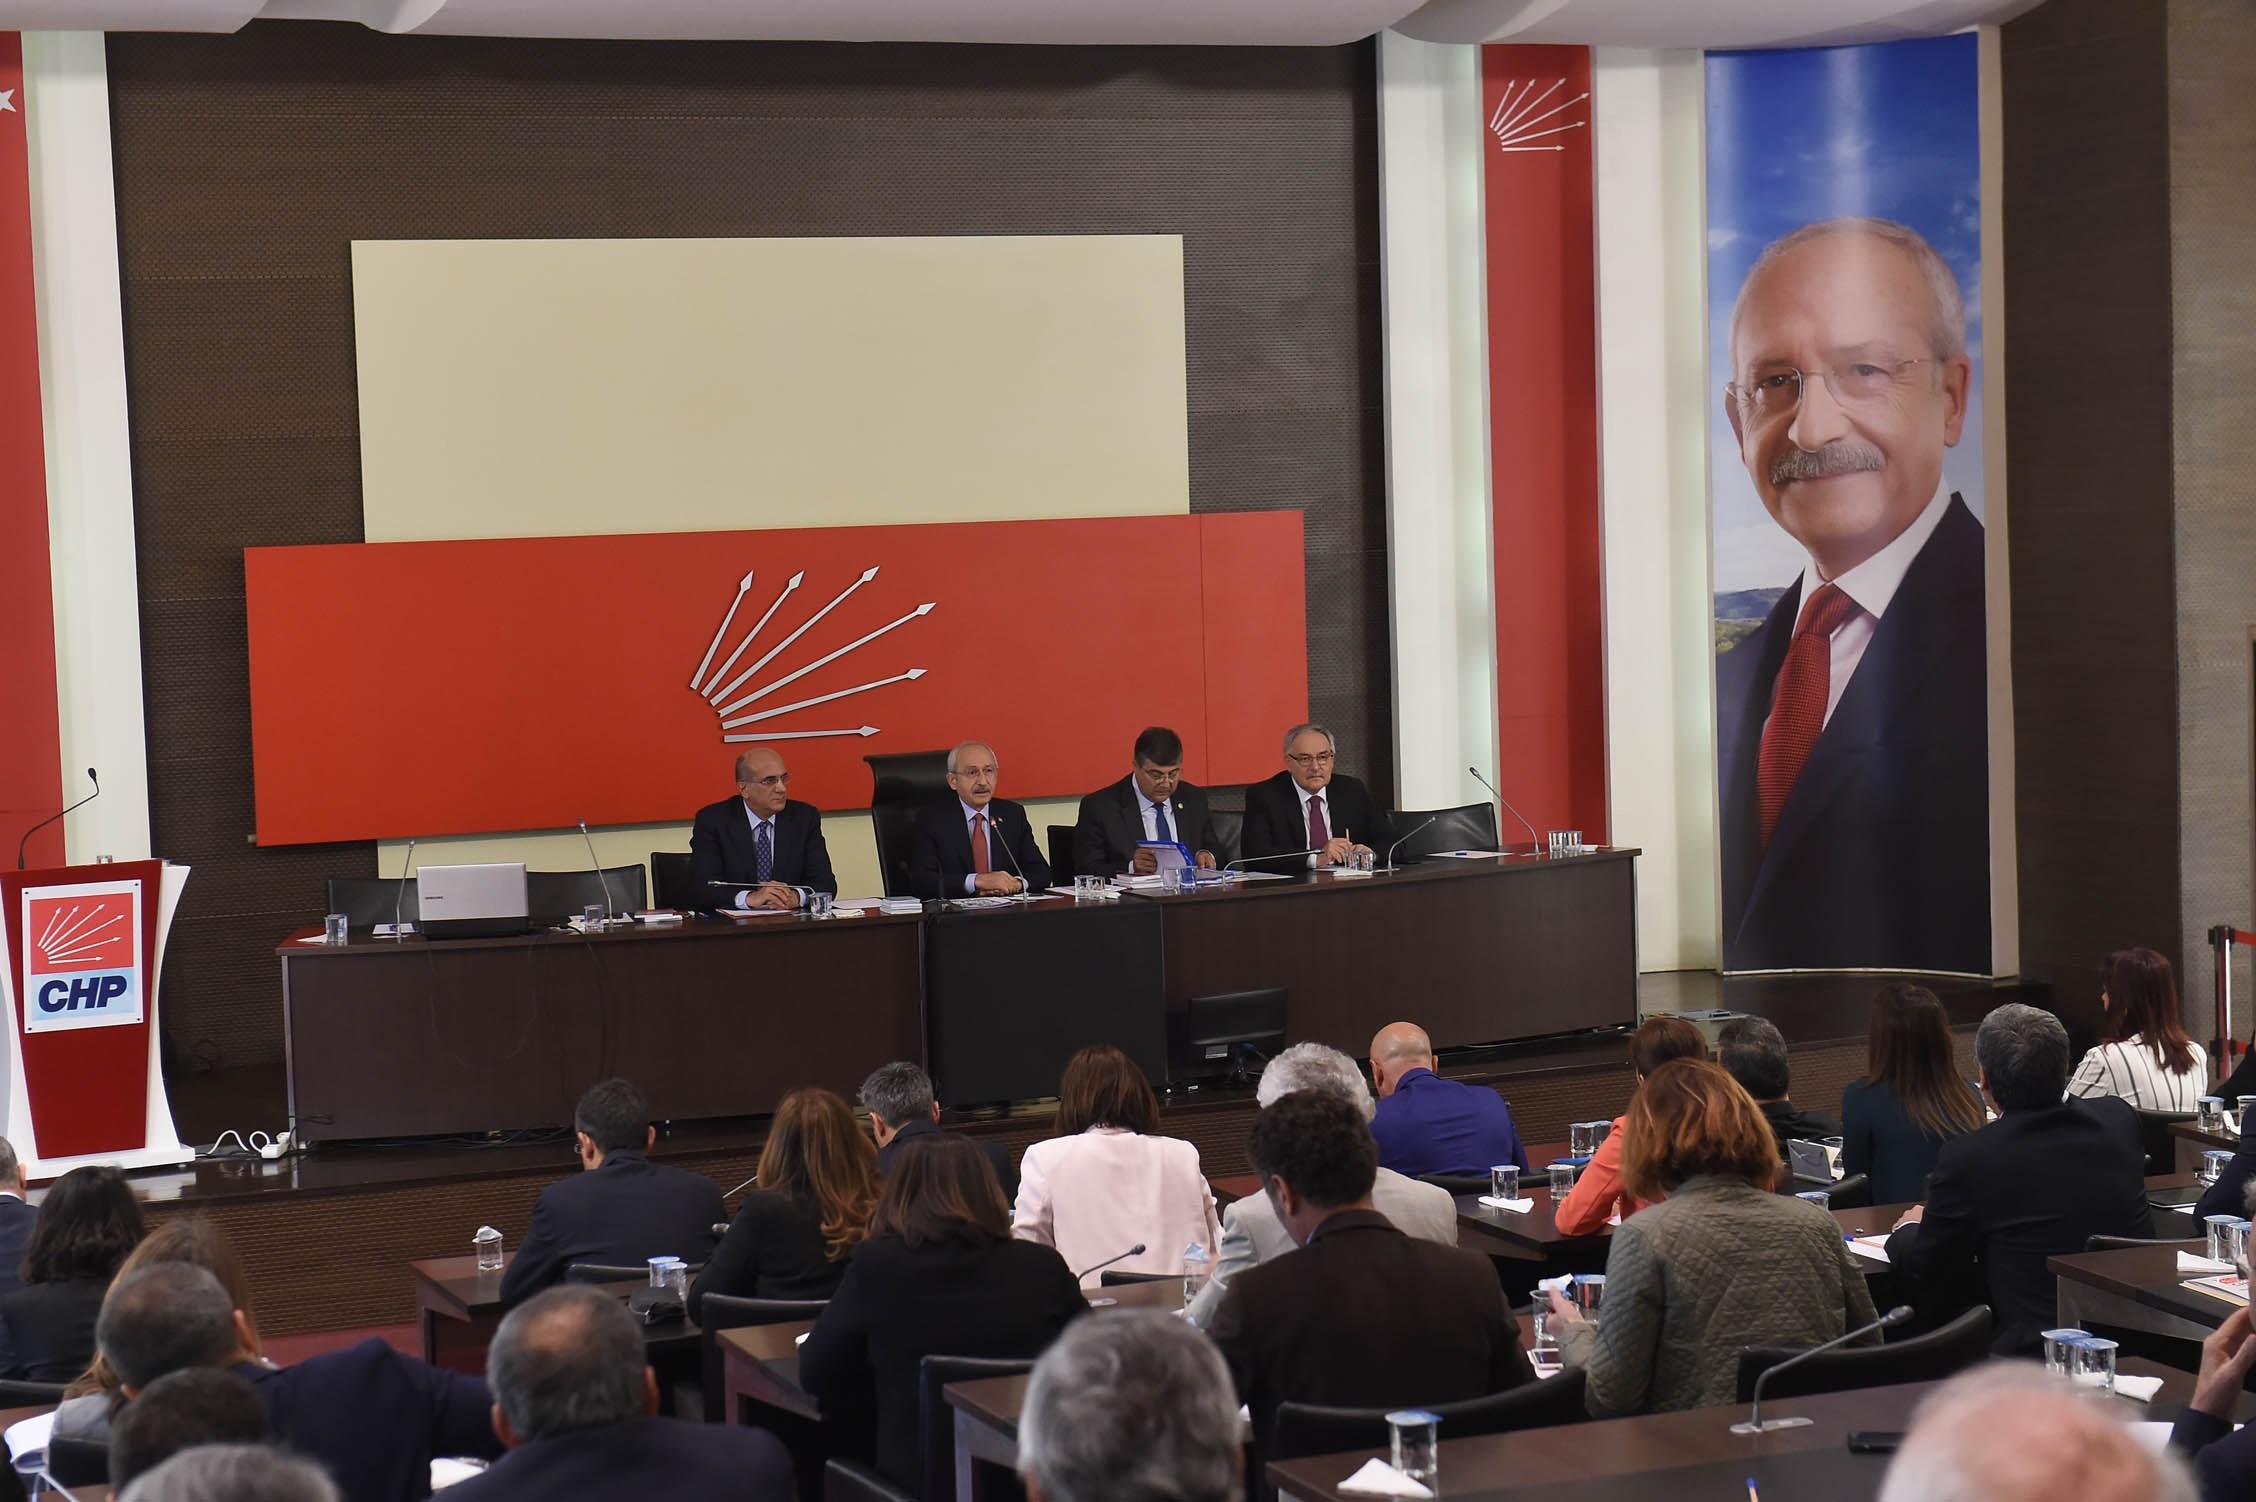 CHP PM, Fikri Sağlar gündemiyle olağanüstü toplandı